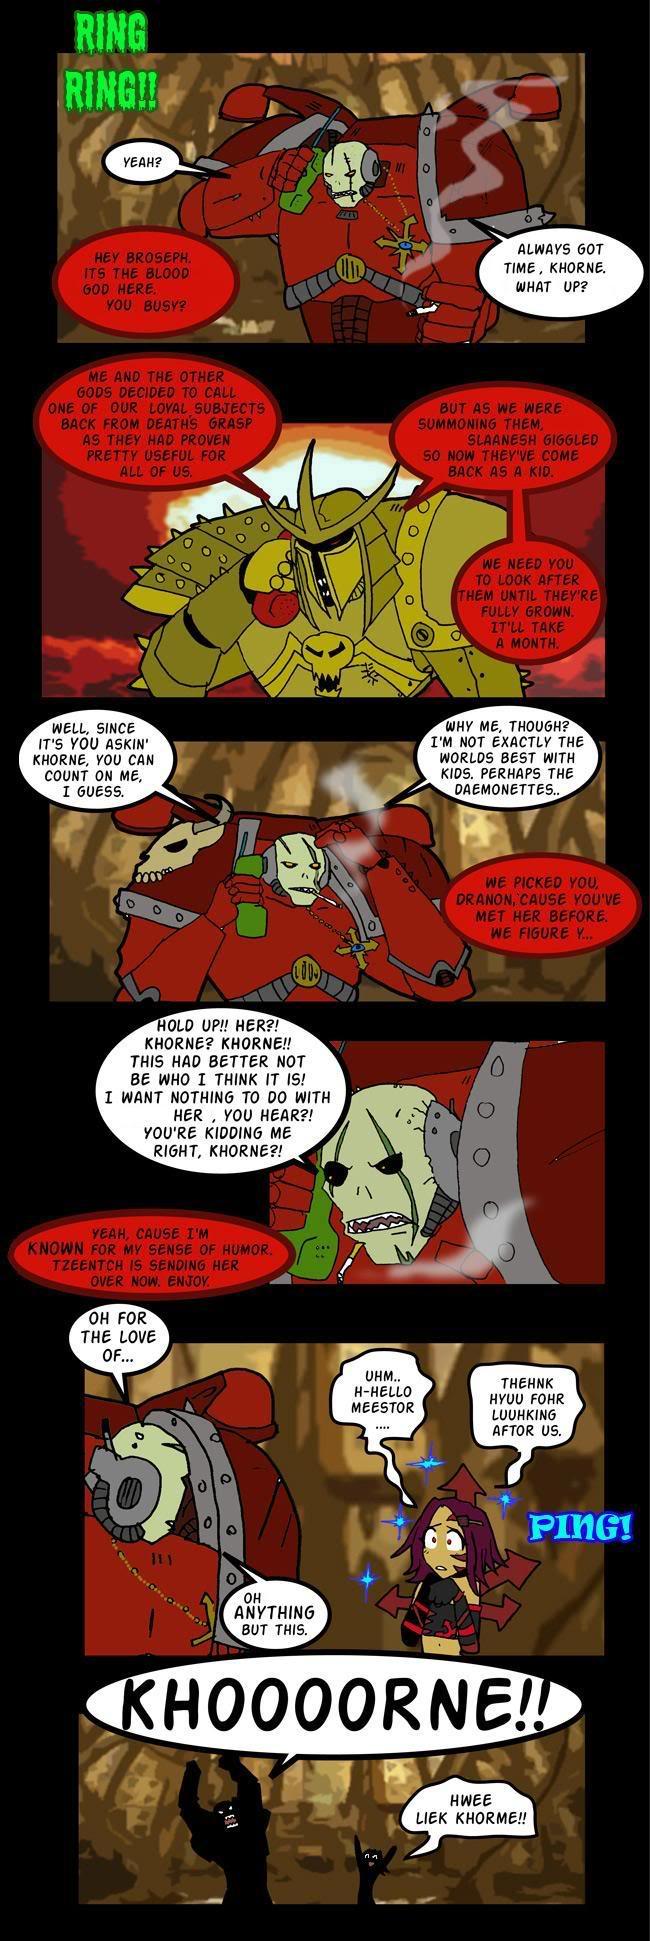 Funny 40K - Pagina 5 For_the_Dark_Gods_by_Mr_Culexus